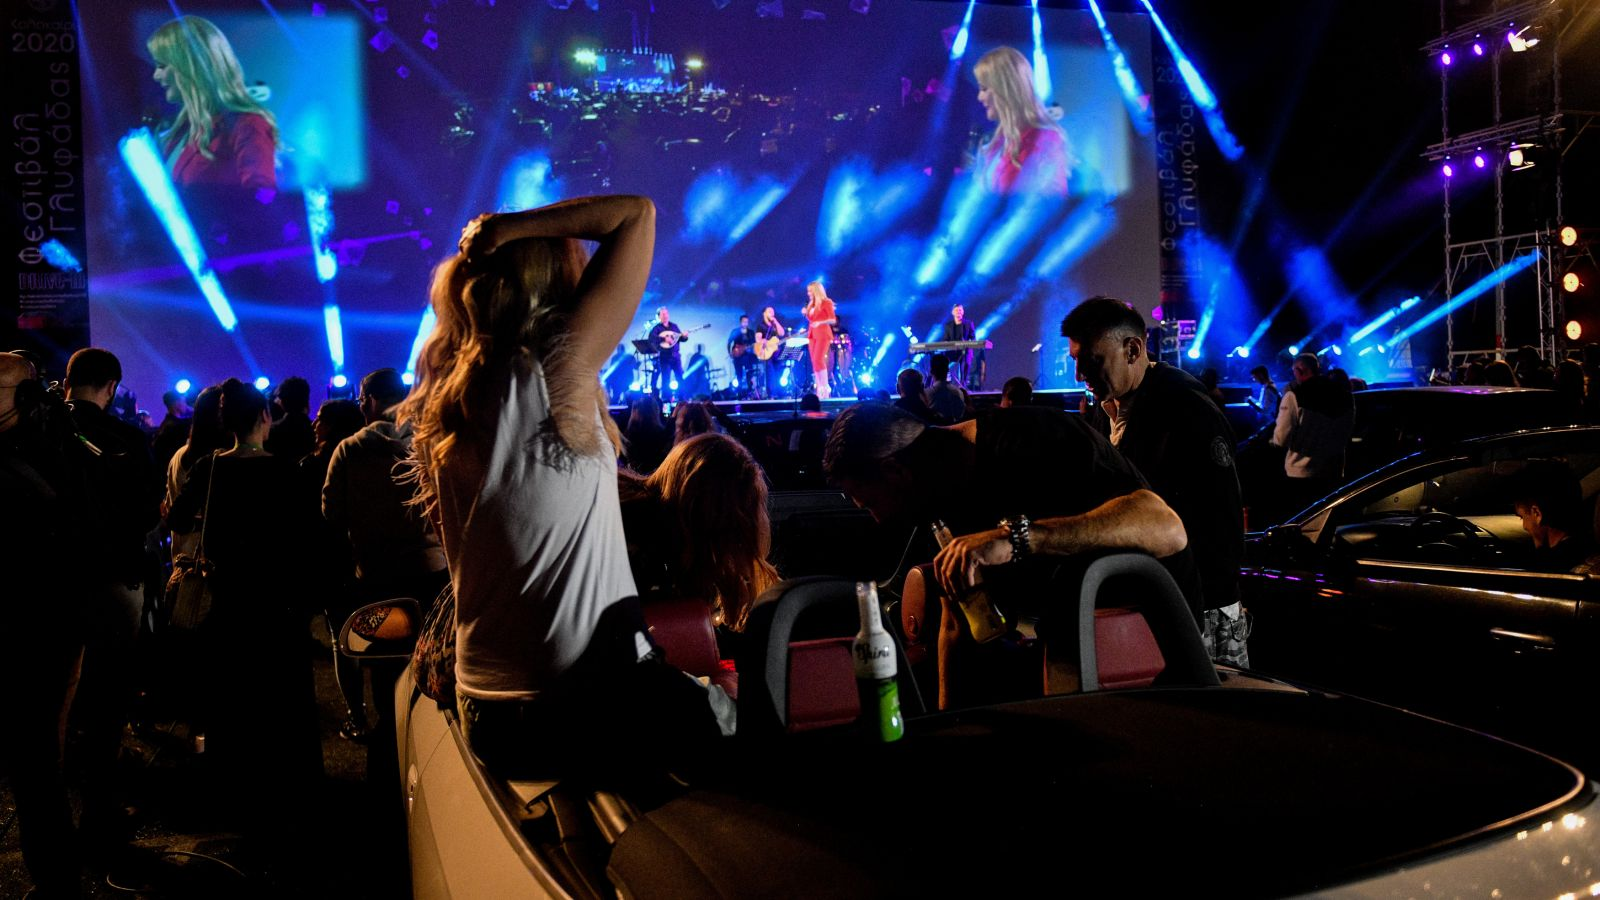 Guardian Θεοδωρίδου: Θέμα η πρώτη drive in συναυλία – Είναι αυτός ο τρόπος που θα γίνονται από εδώ και πέρα [vid & pics]